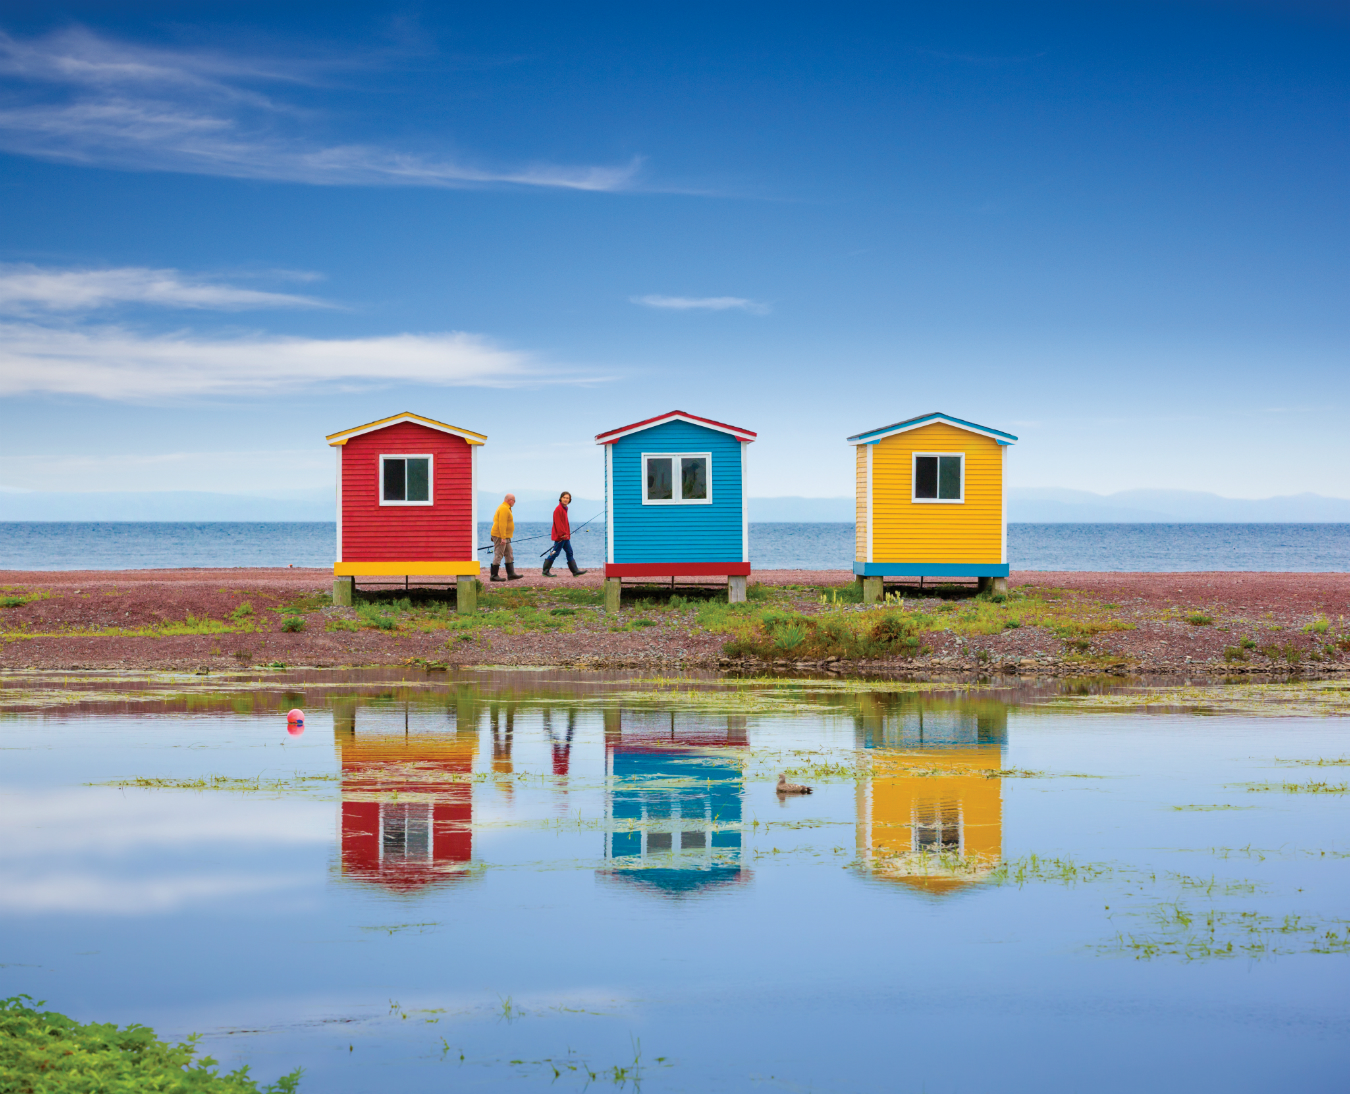 Daily Edit: Canada's Beautiful Beaches